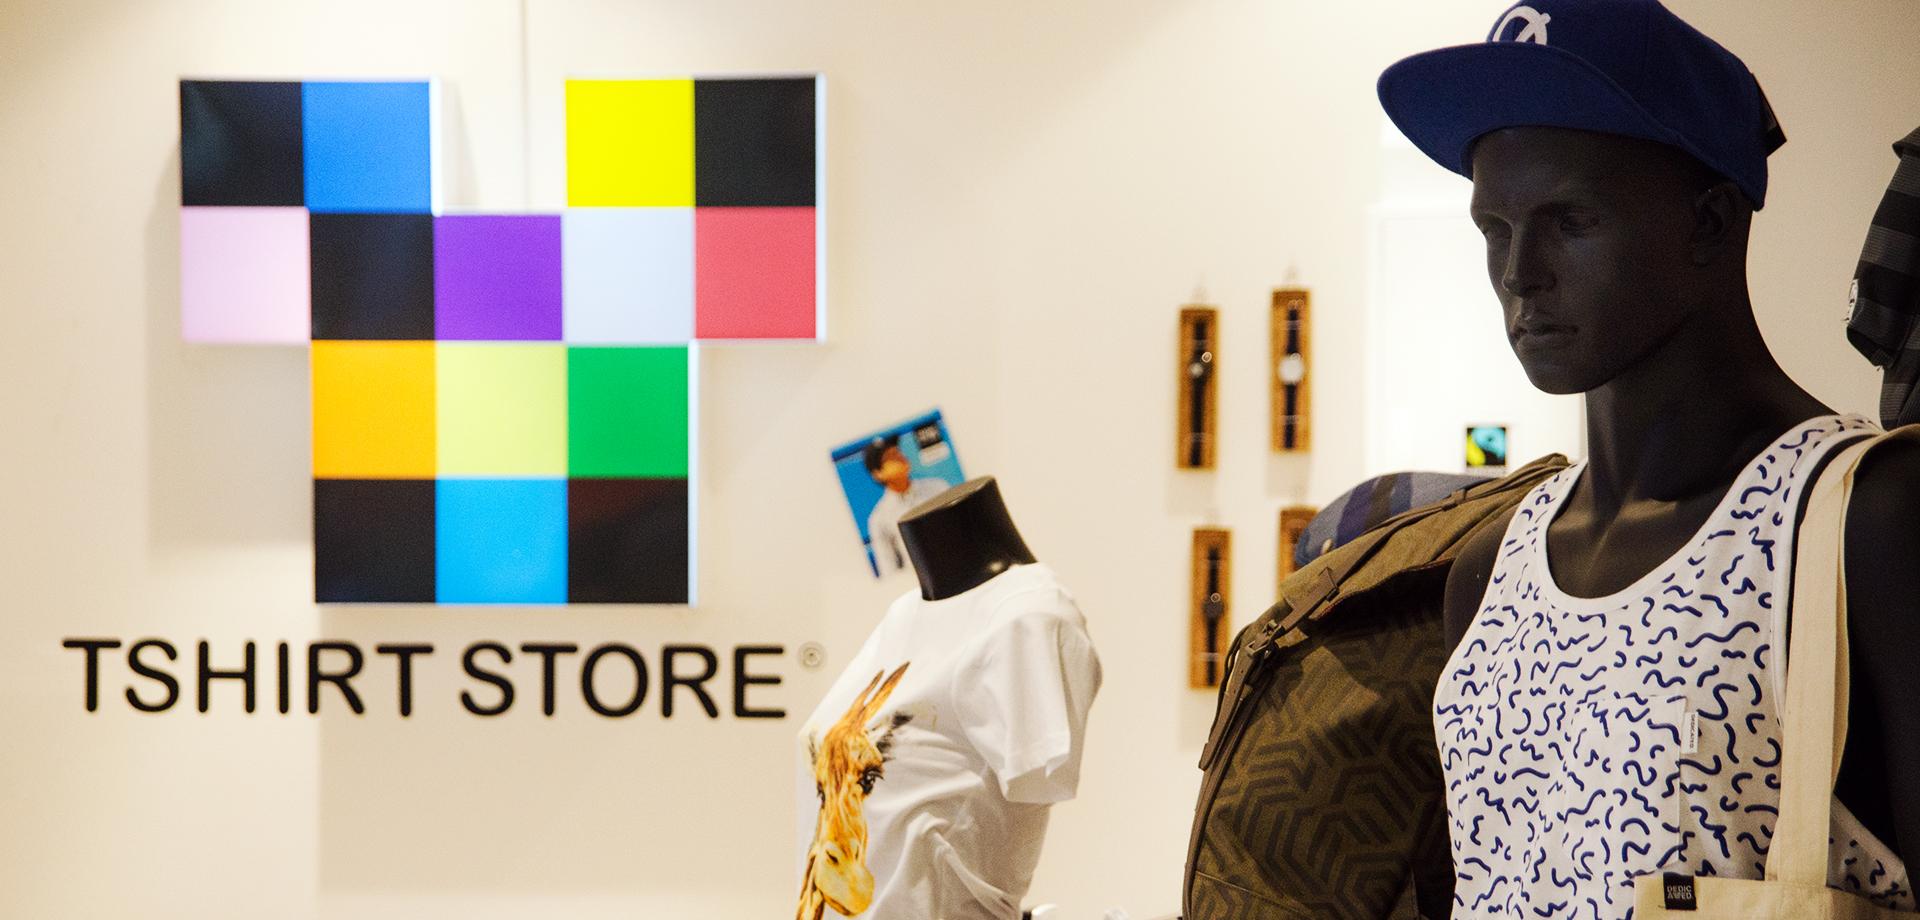 Tshirt-Store: Coole Fairtrade Kleidung in Oldenburg